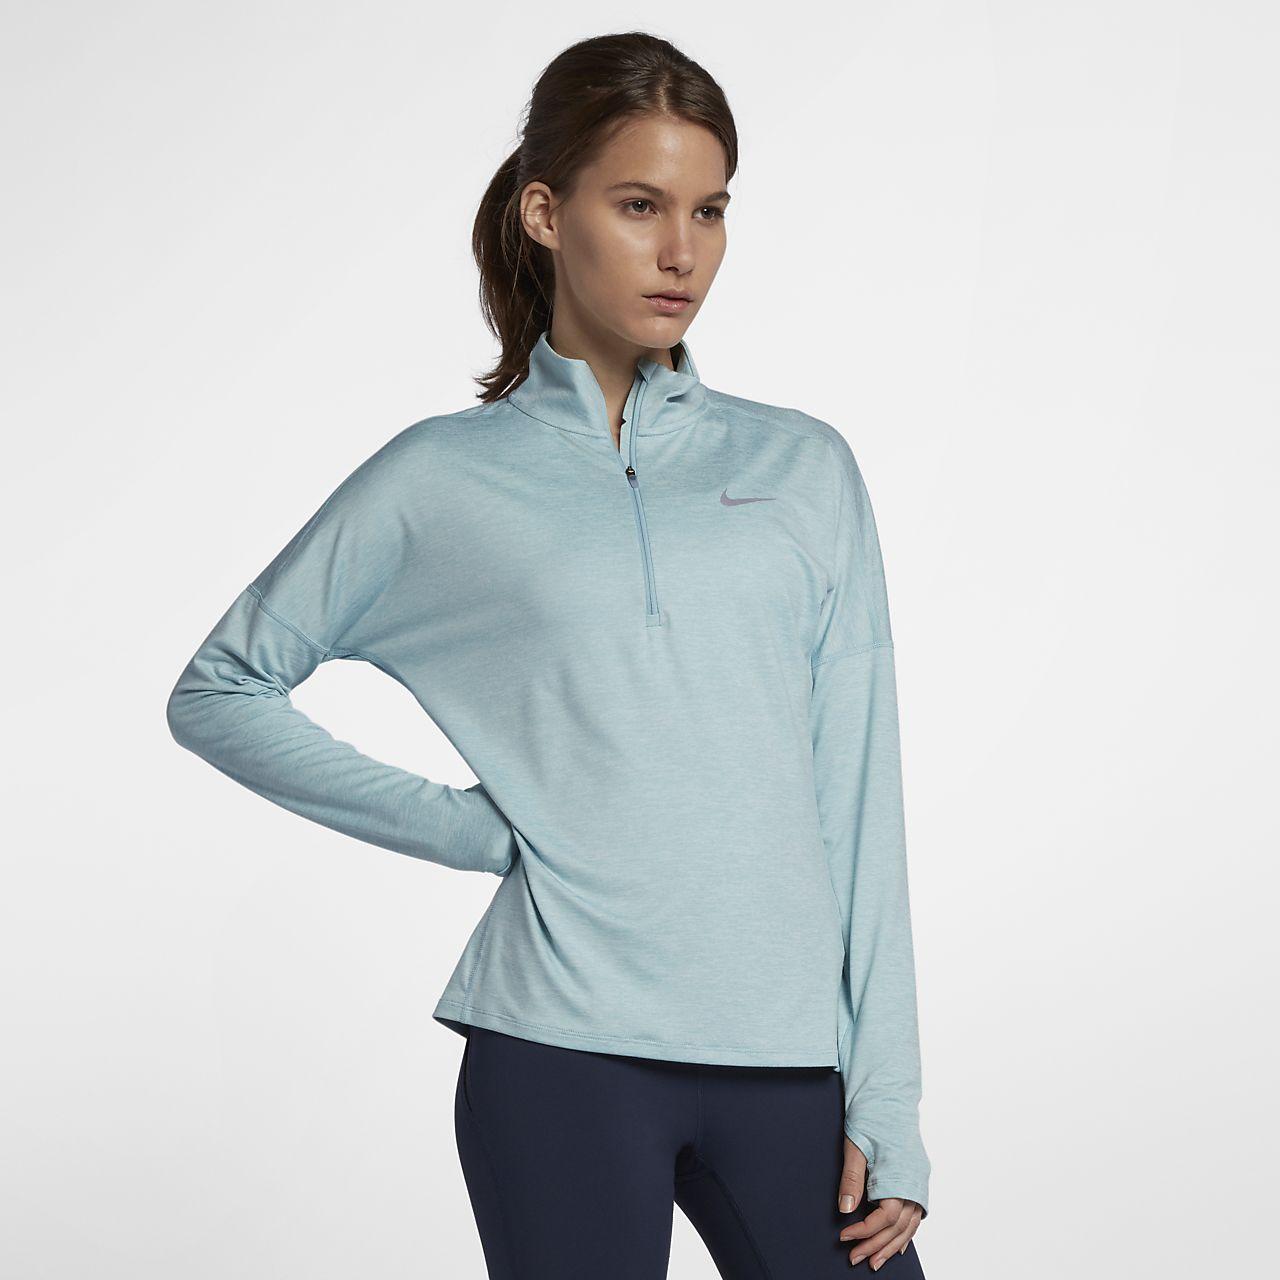 Nike Dri-FIT Element Women s Long-Sleeve Running Half-Zip Top. Nike ... b29a07e62516